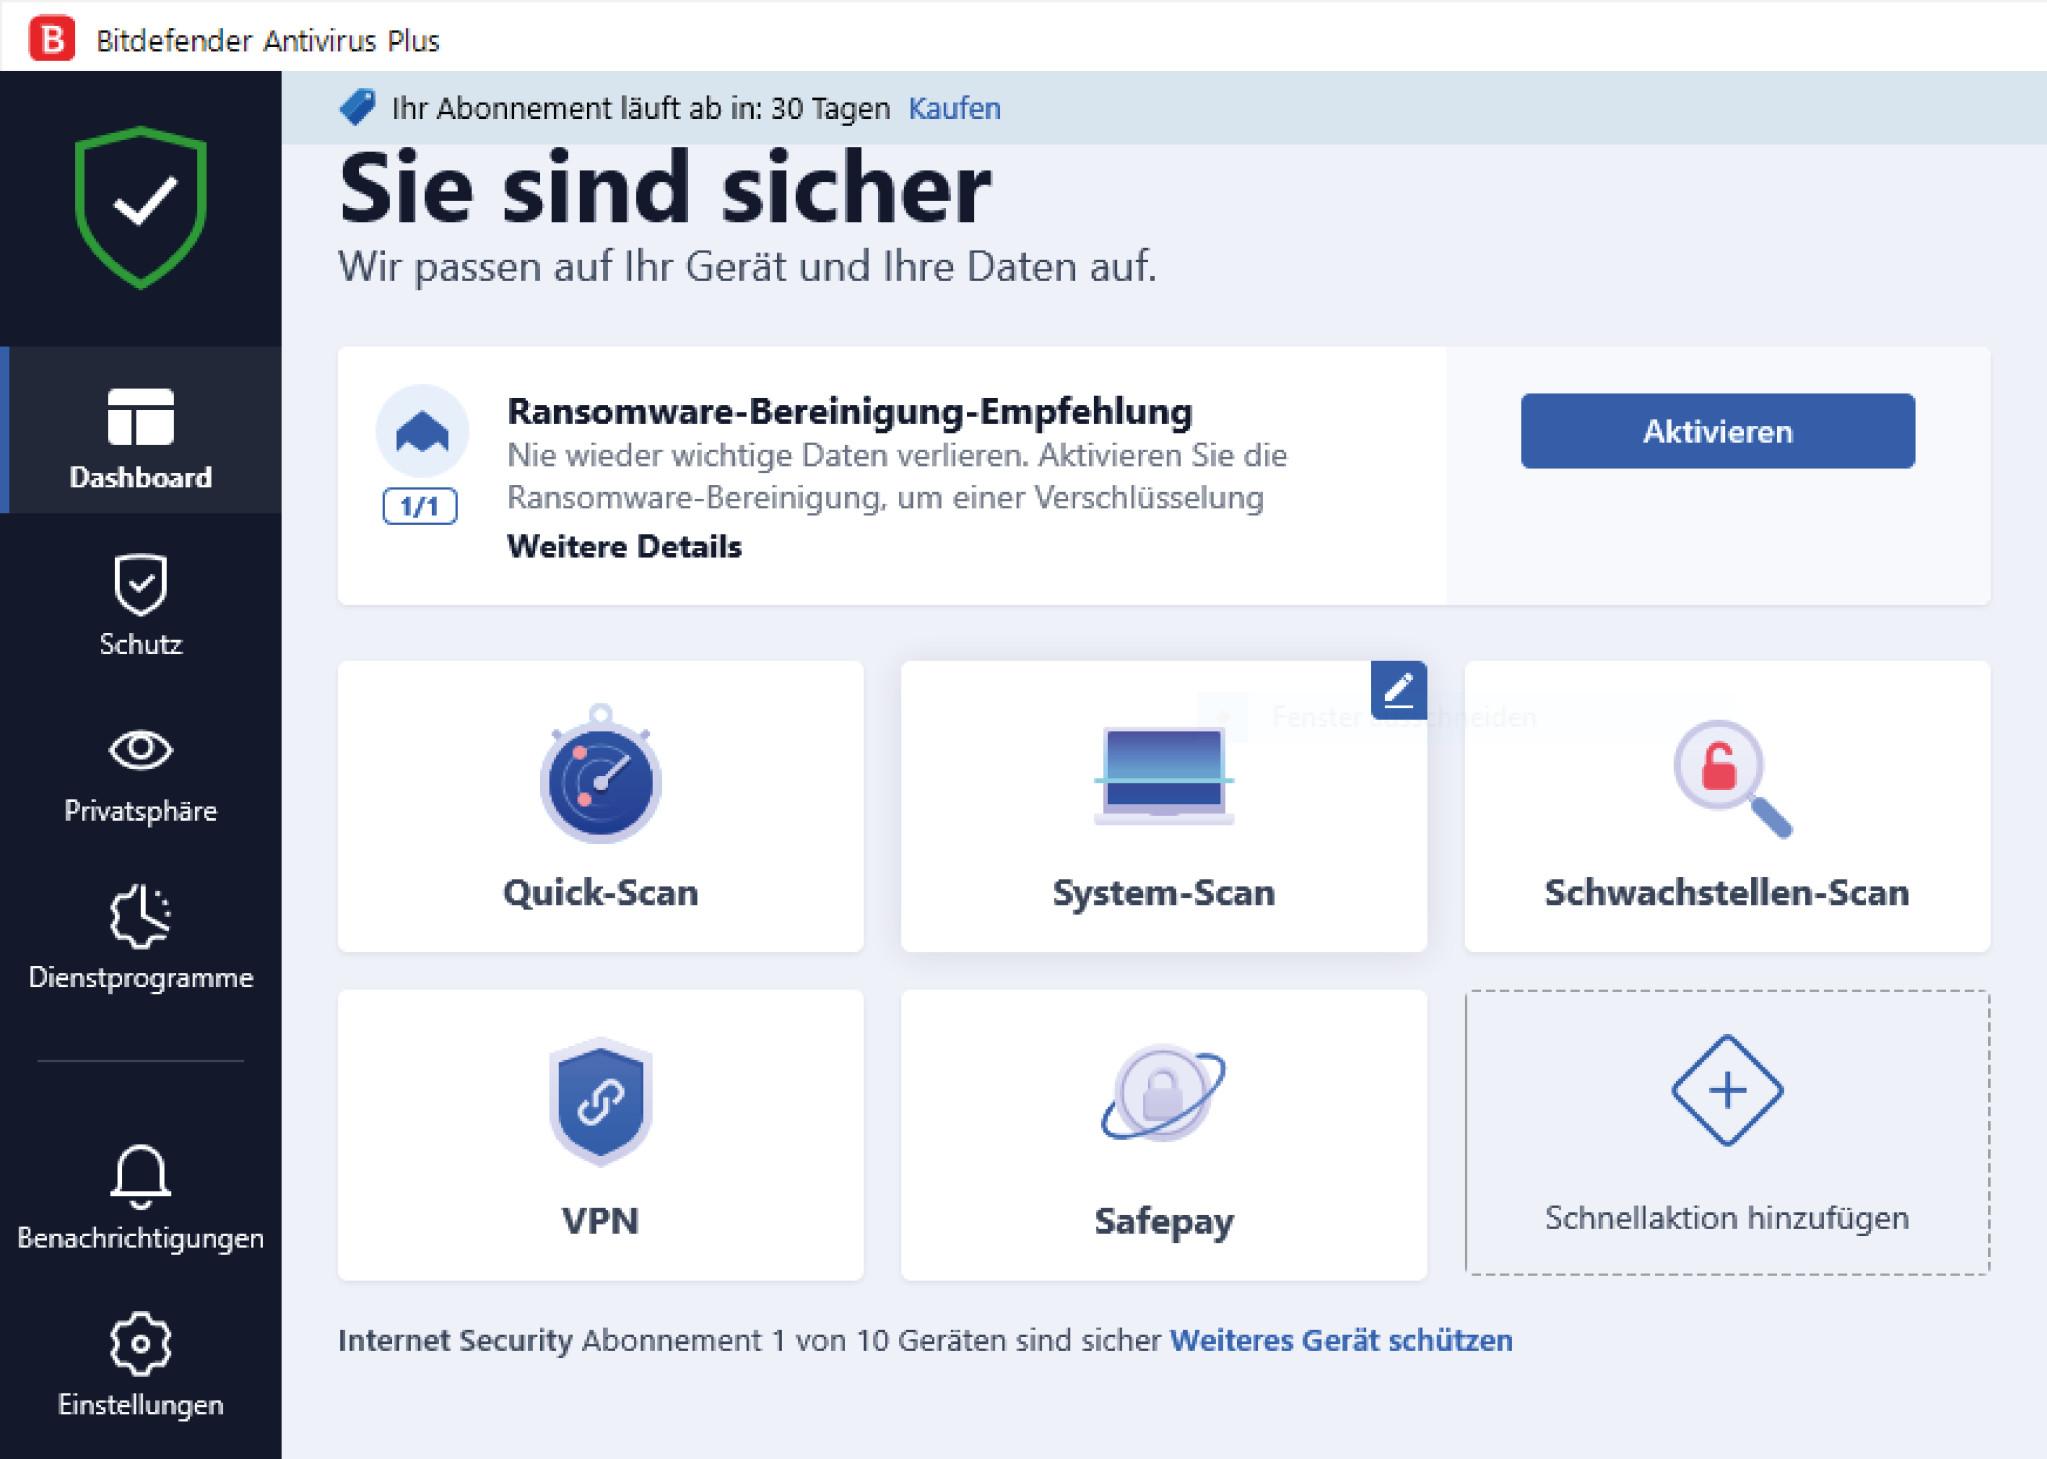 Screenshot 1 - Bitdefender Antivirus Plus 2022